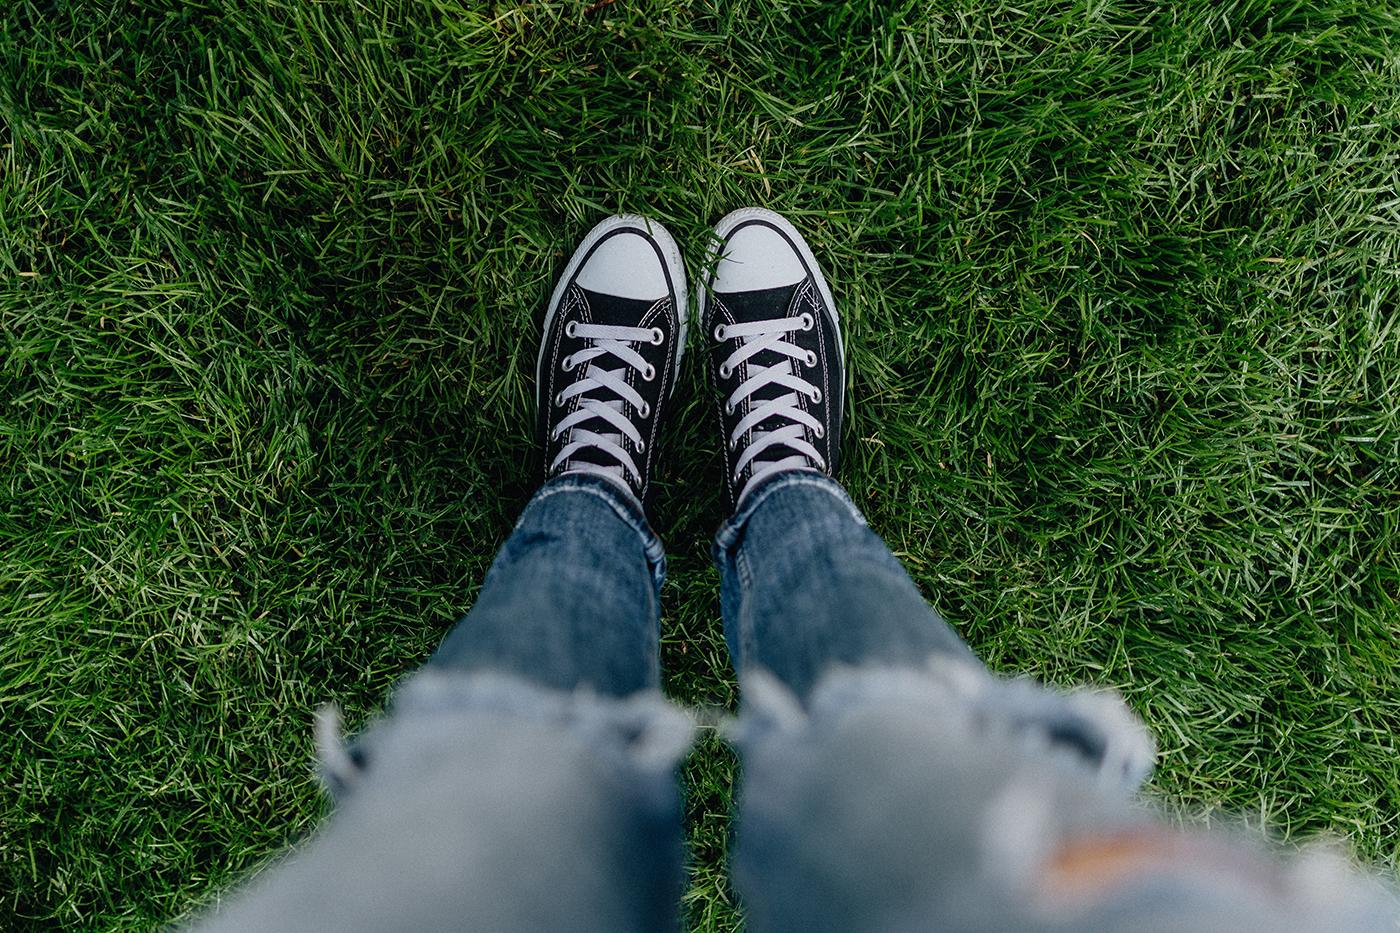 Standing on grass